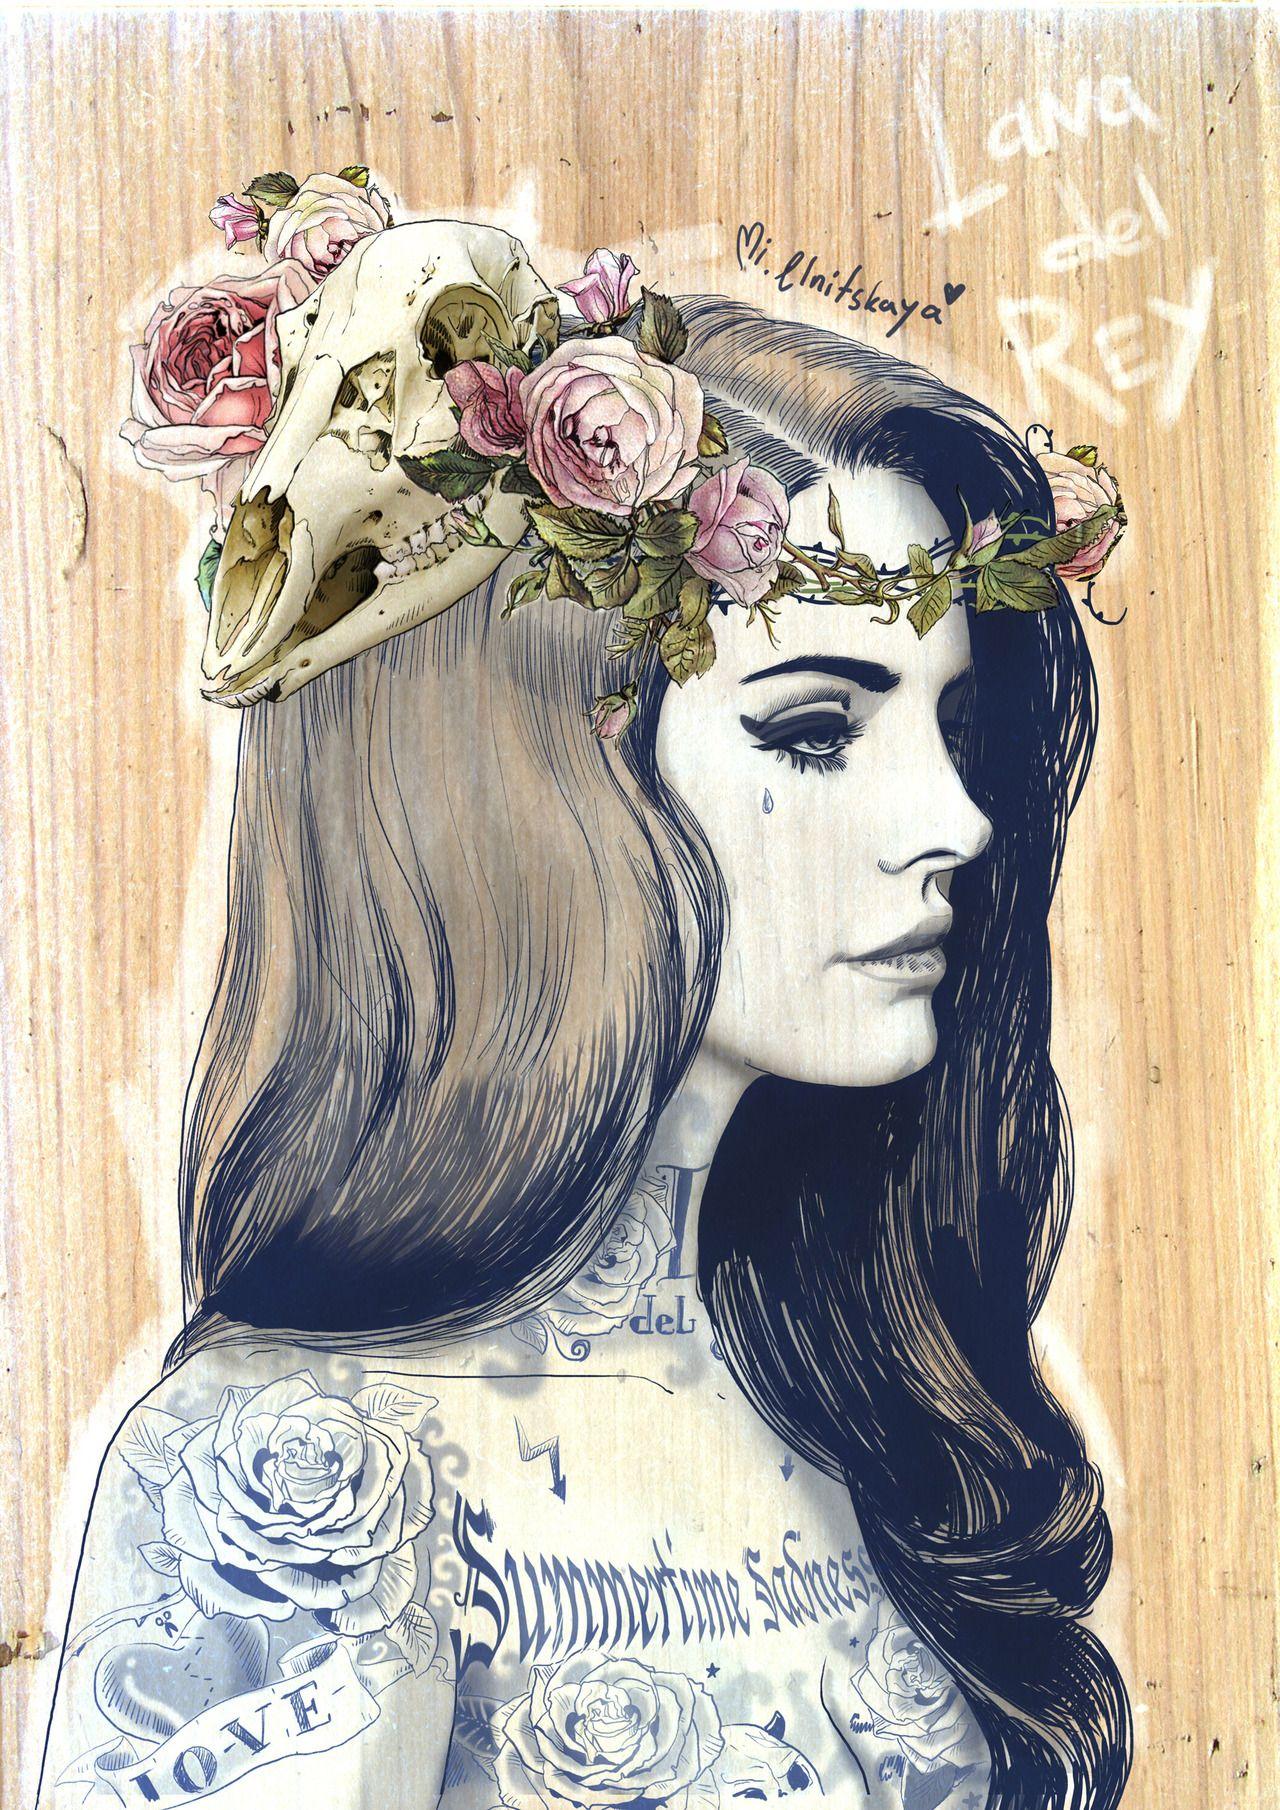 Iphone wallpaper tumblr lana - Illustrations By Mimi Ilnitskaya